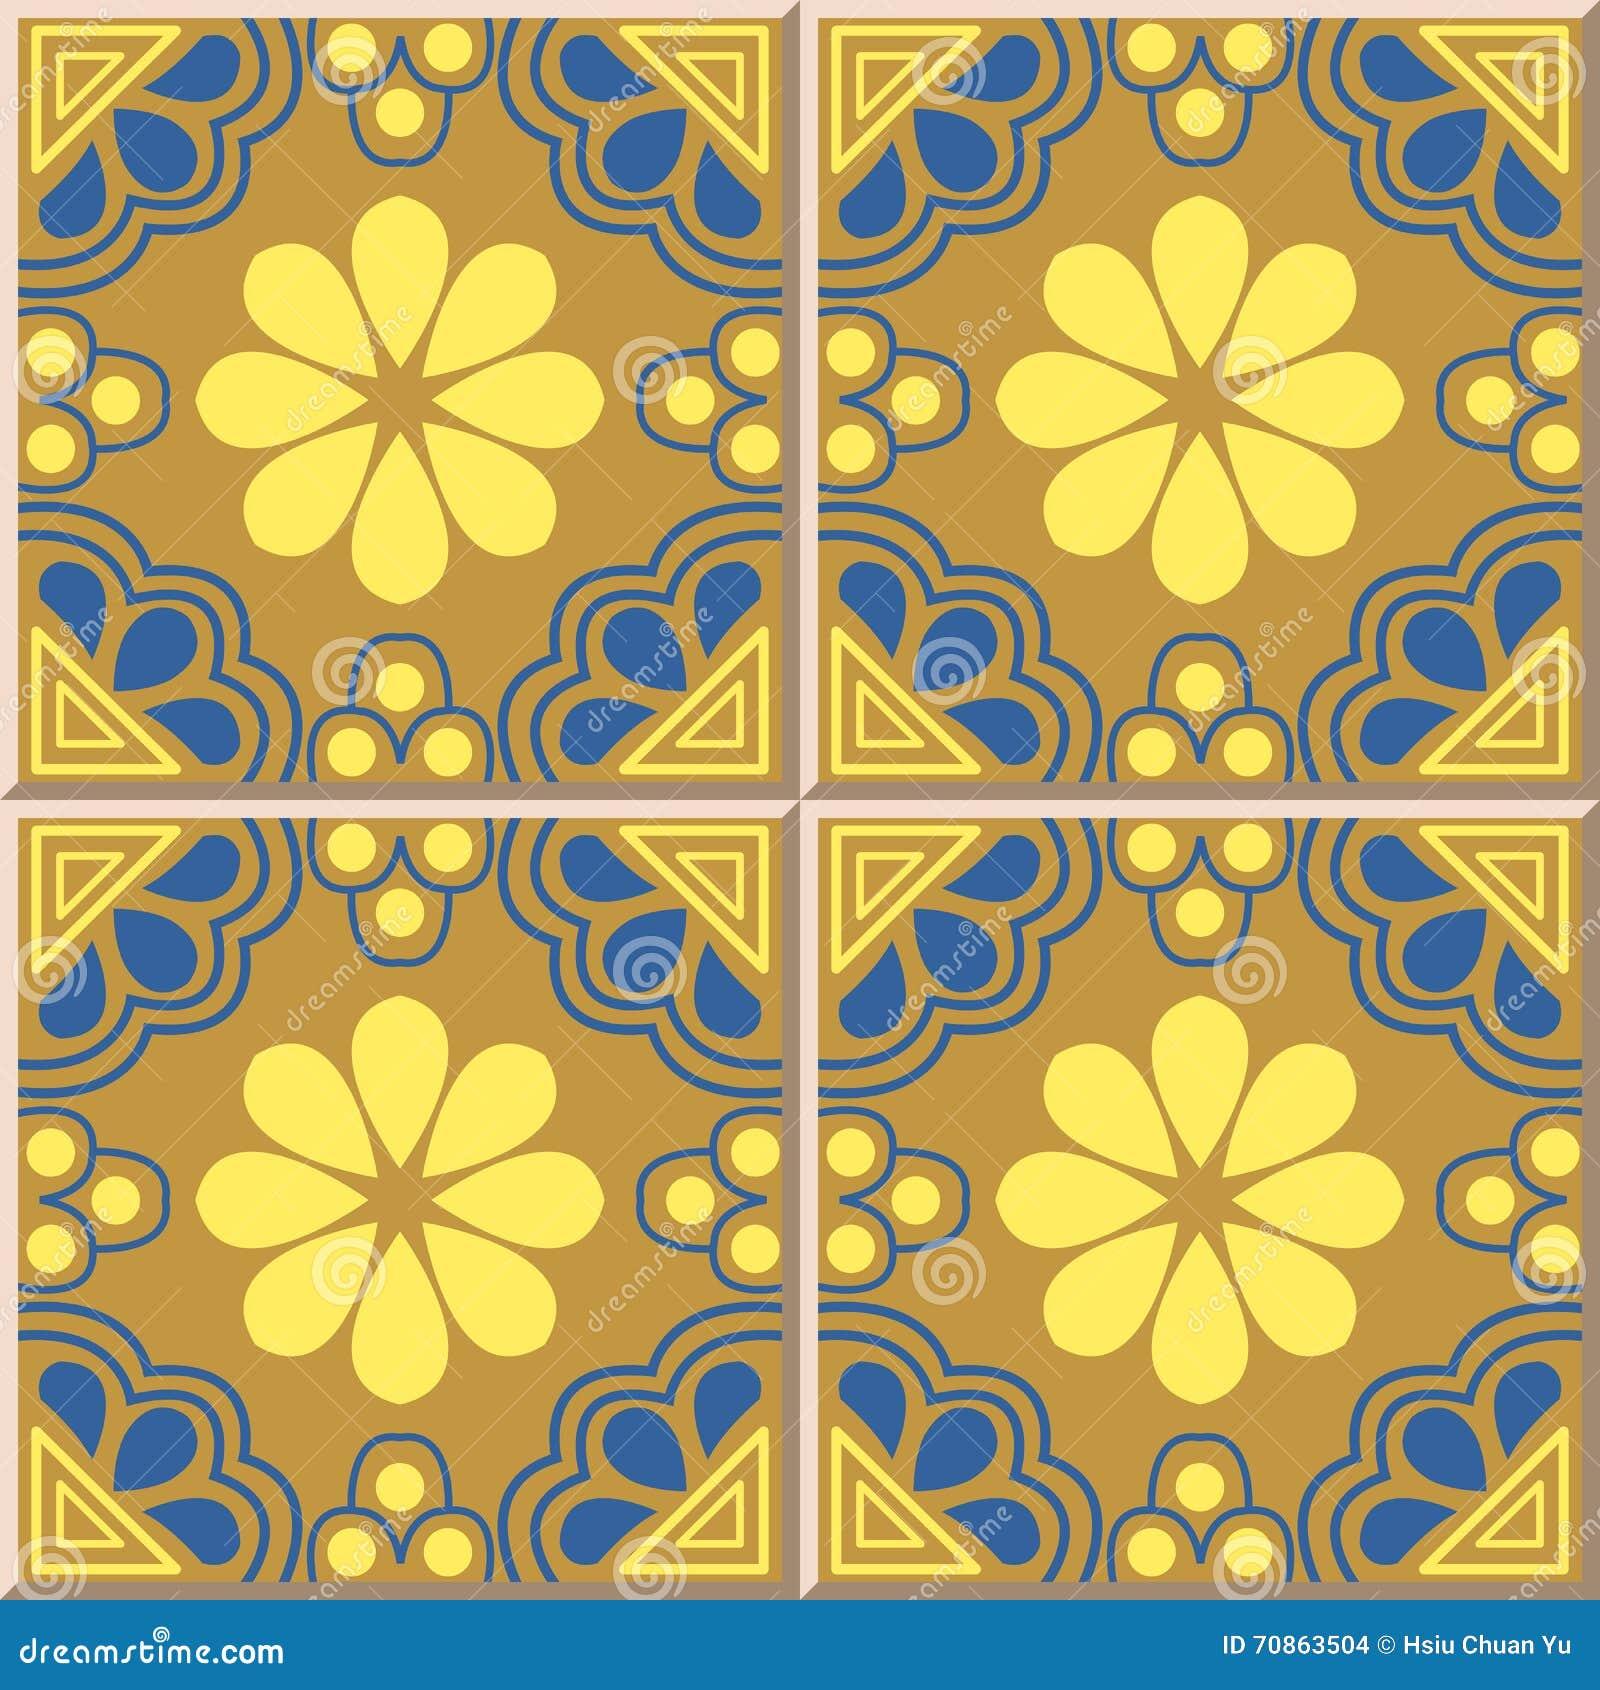 Pretty 12X24 Ceramic Floor Tile Small 16X16 Ceiling Tiles Flat 2X2 Ceiling Tile 2X2 Ceiling Tiles Young 3 By 6 Subway Tile Blue3 X 6 Glass Subway Tile Ceramic Tile Pattern 340 Oriental Golden Yellow Flower Triangle ..